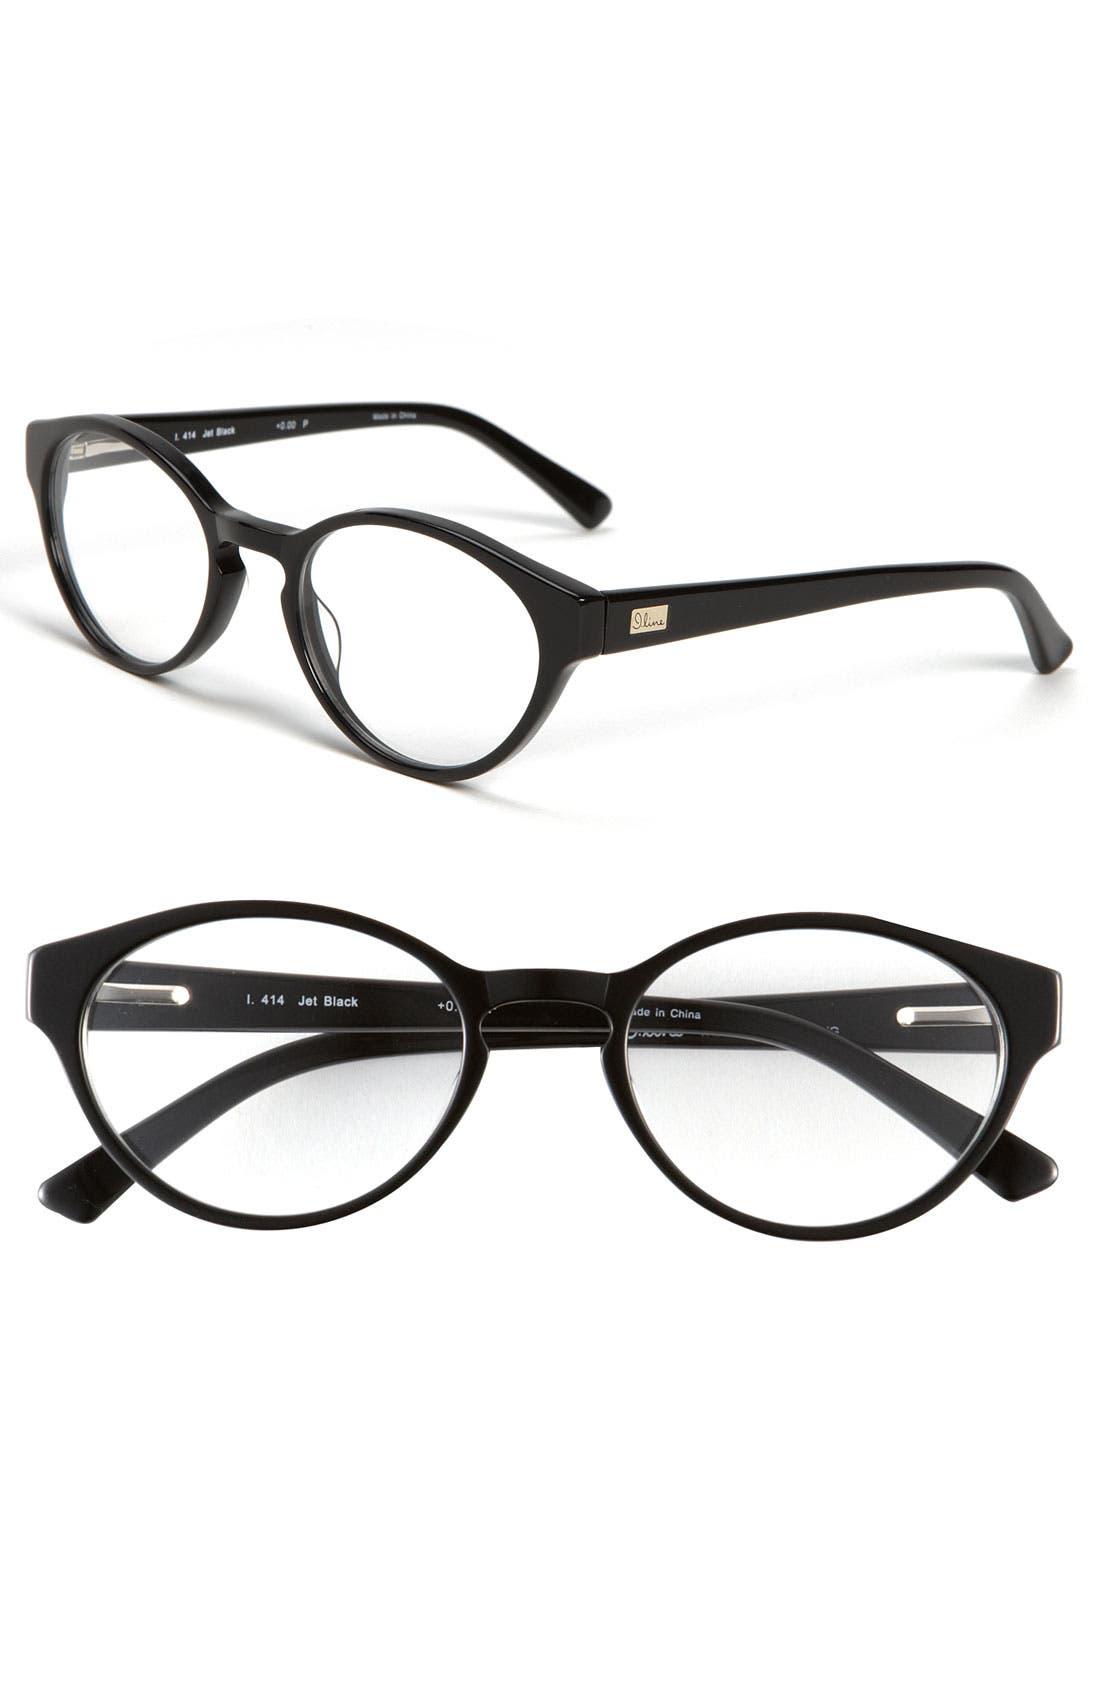 Main Image - I Line Eyewear 'Jet Black' Reading Glasses (2 for $88)